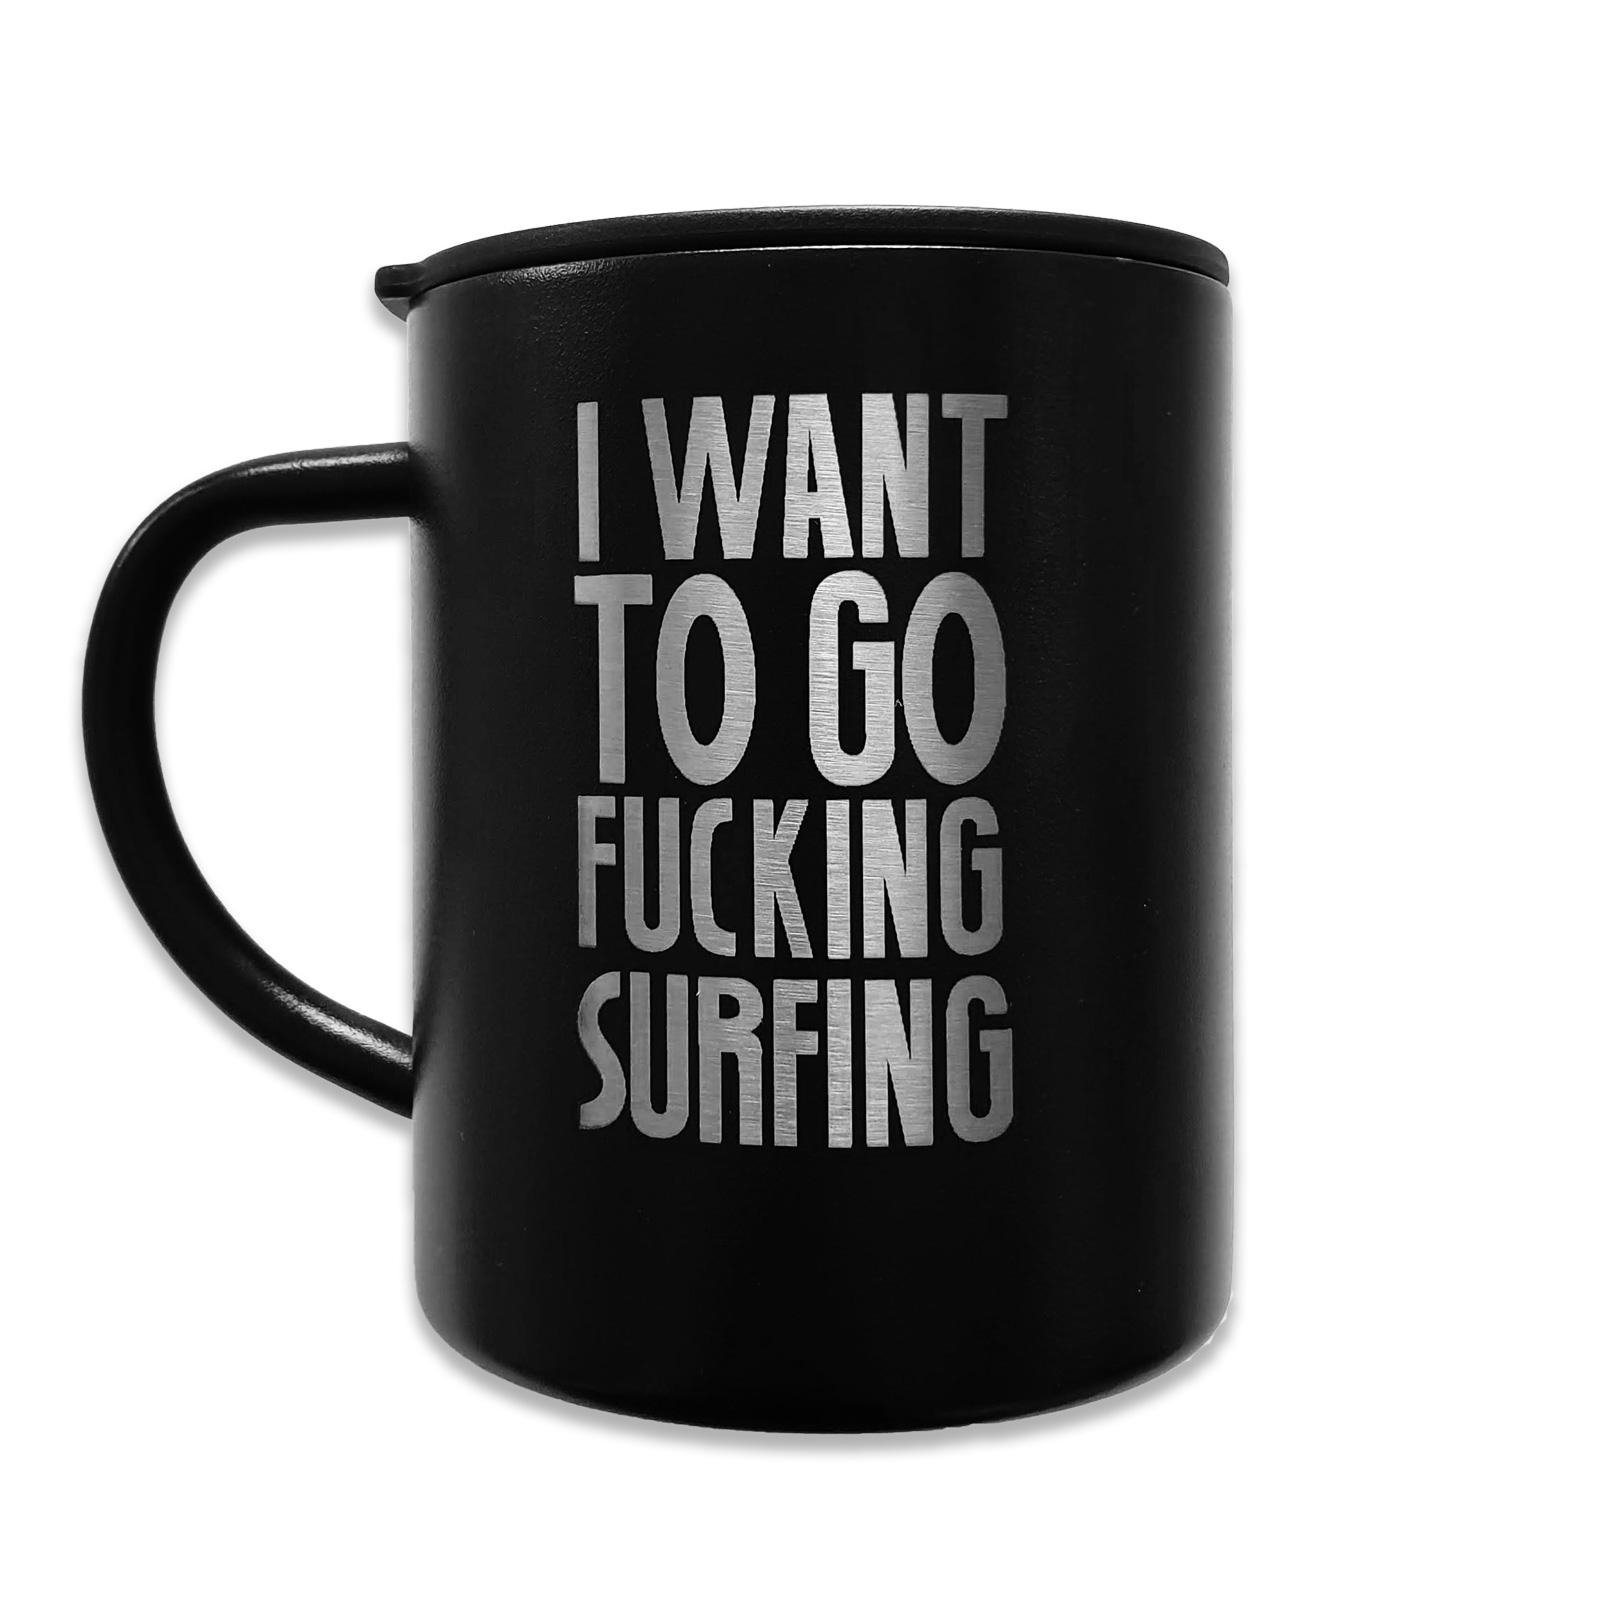 Sea-Sick-Surf-Shop-Steel-Coffee-Mug-Black-Laser-Etched.jpg